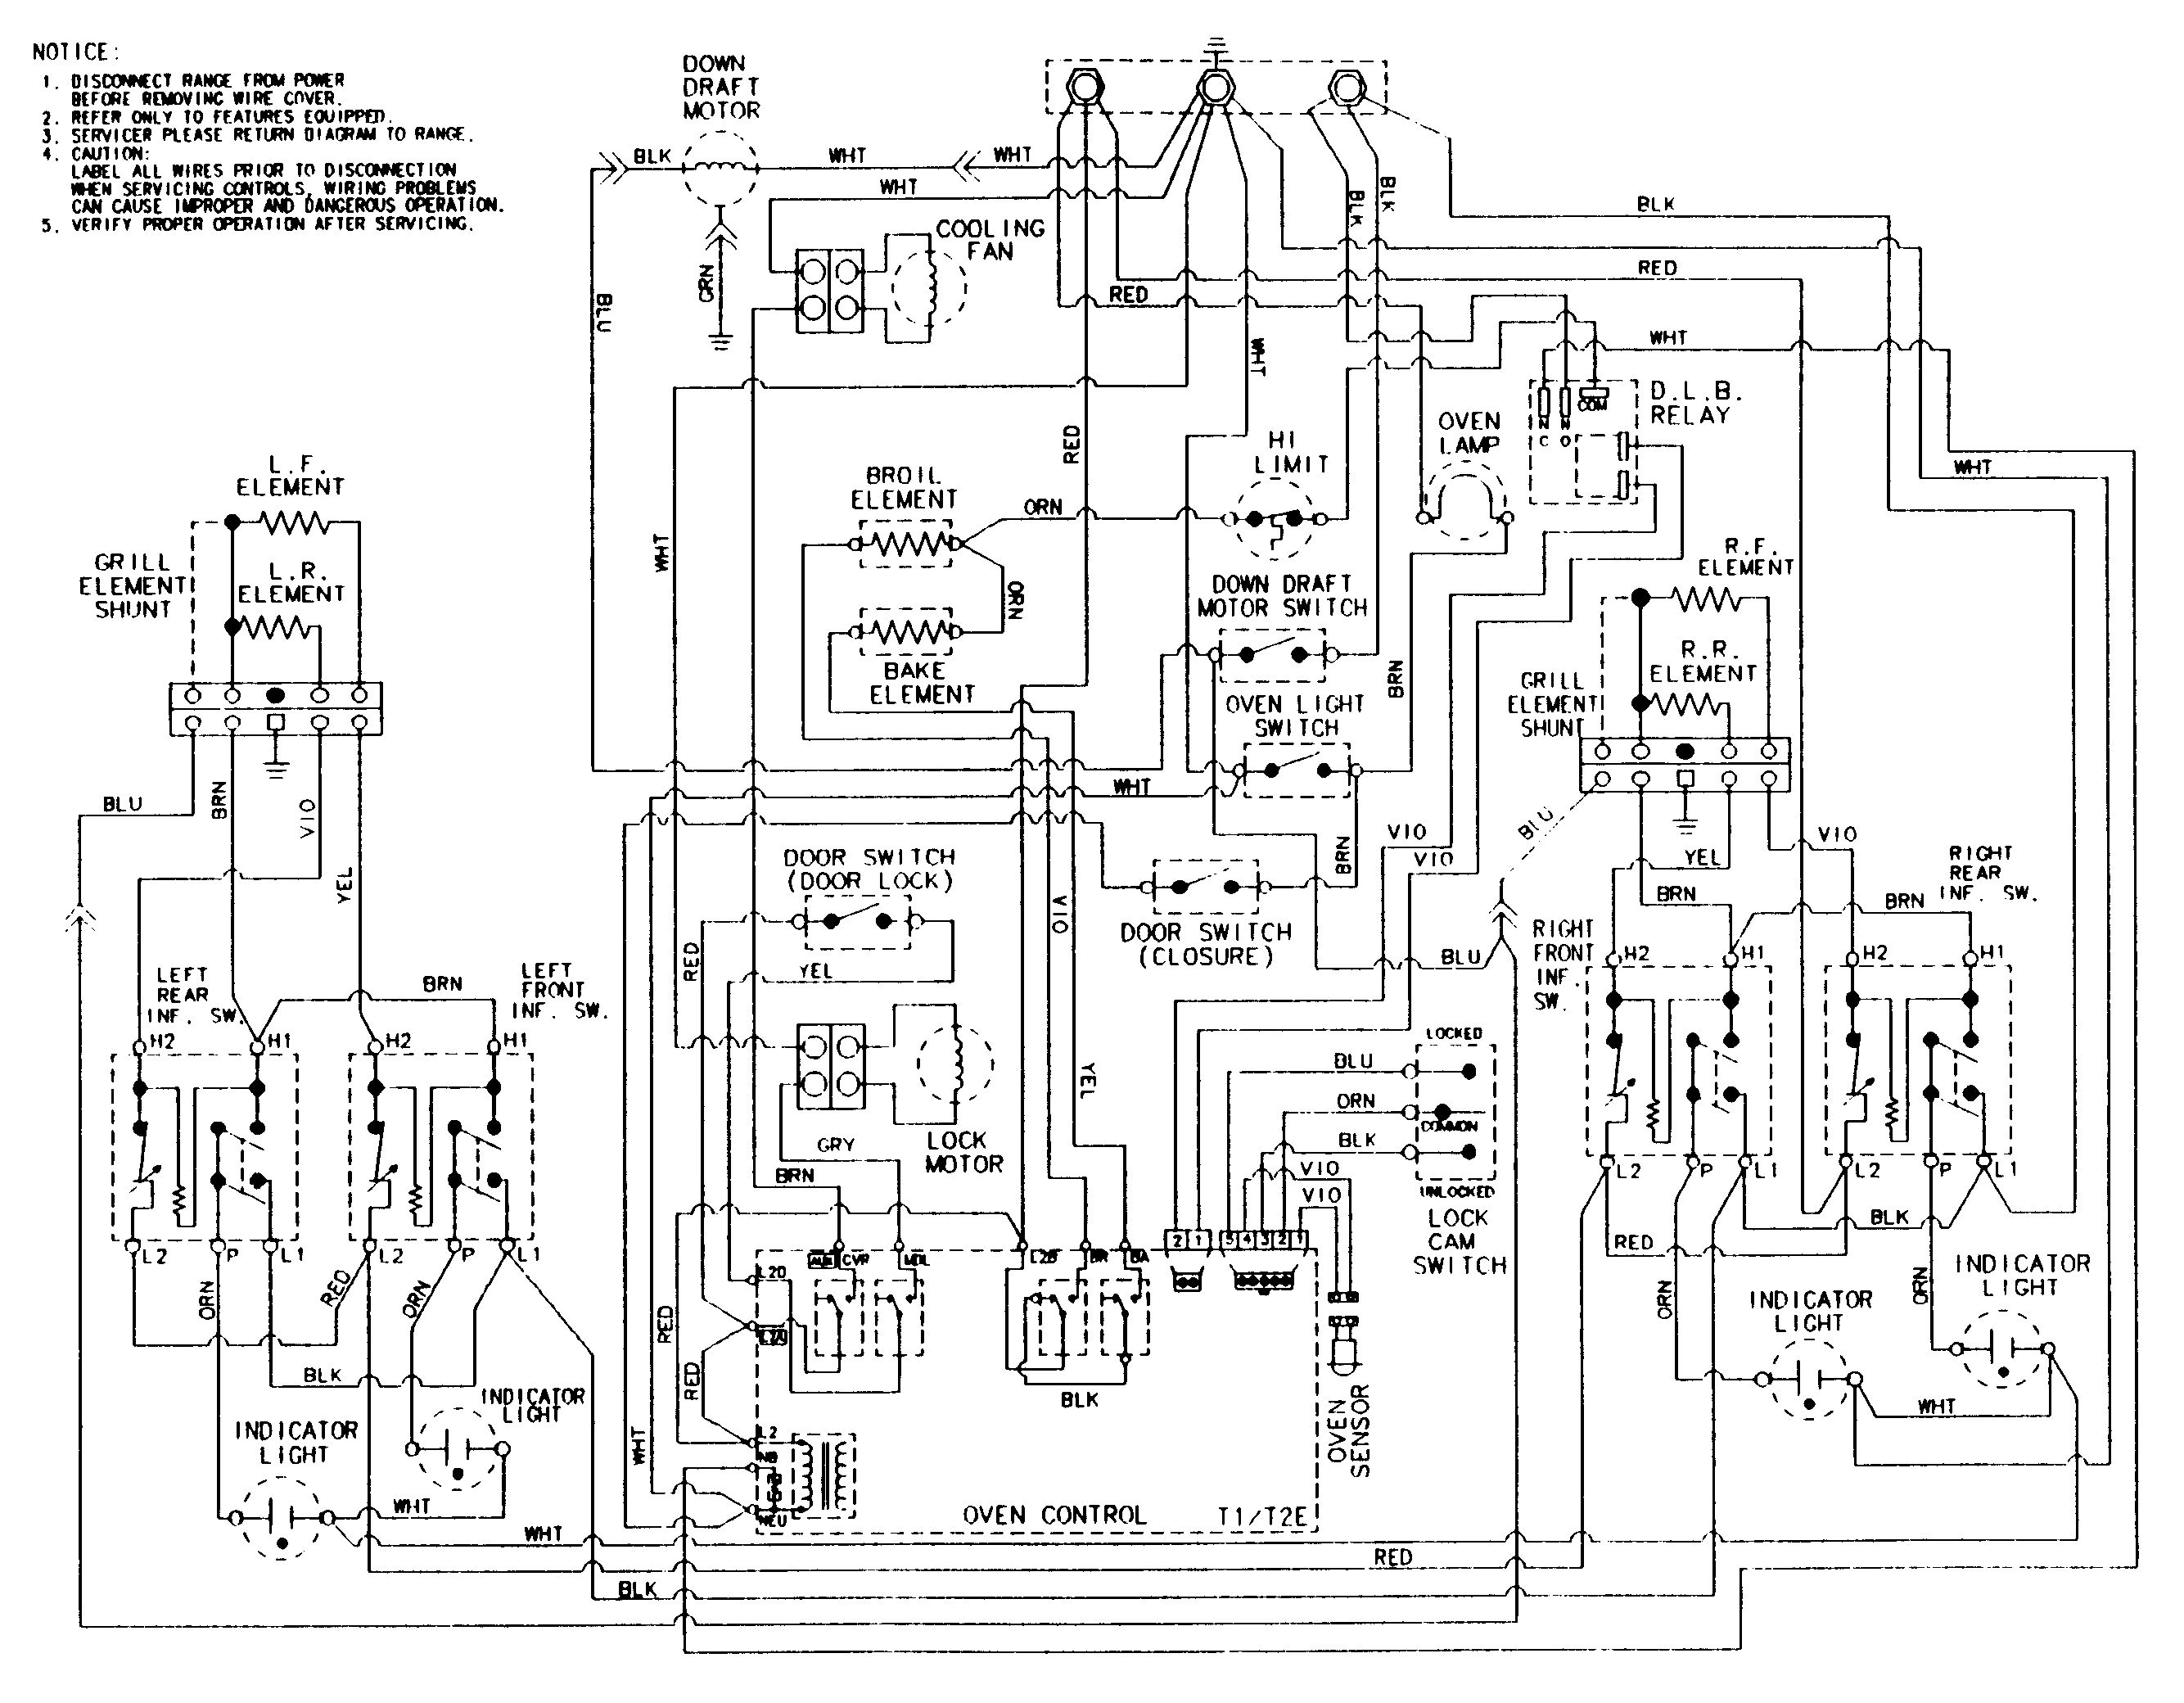 small resolution of jenn air wiring diagrams wiring diagram query jenn air range wiring diagram jenn air wiring diagrams